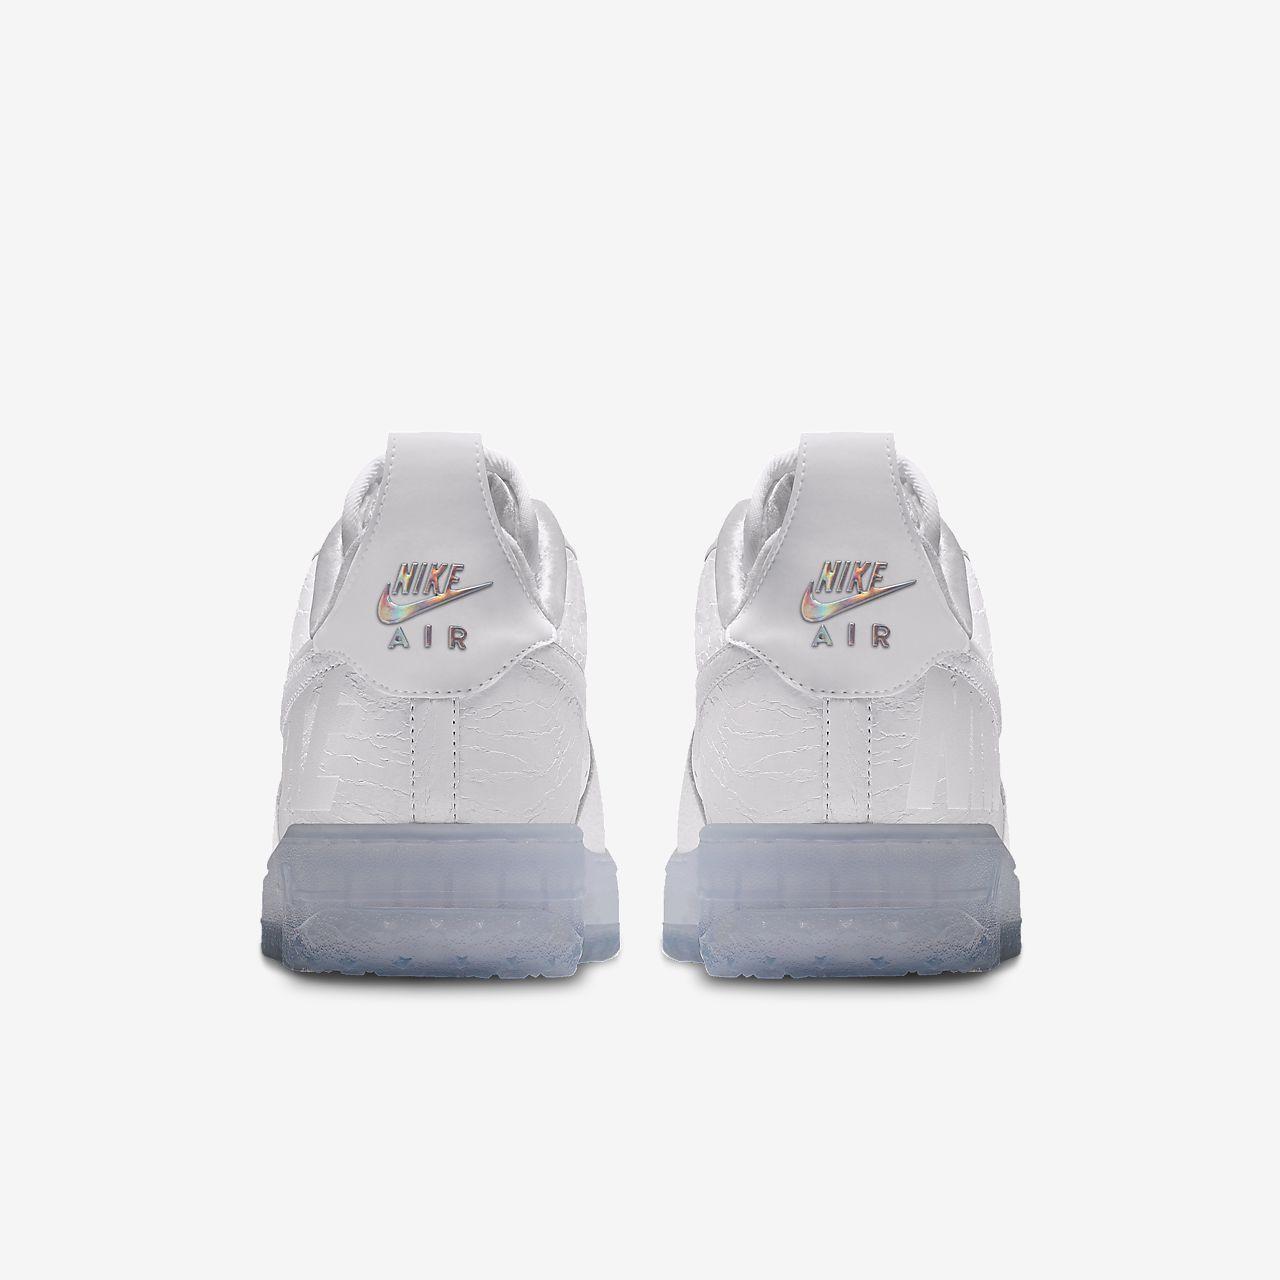 Nike Air Force 1 Low iD Winter White Herrenschuh